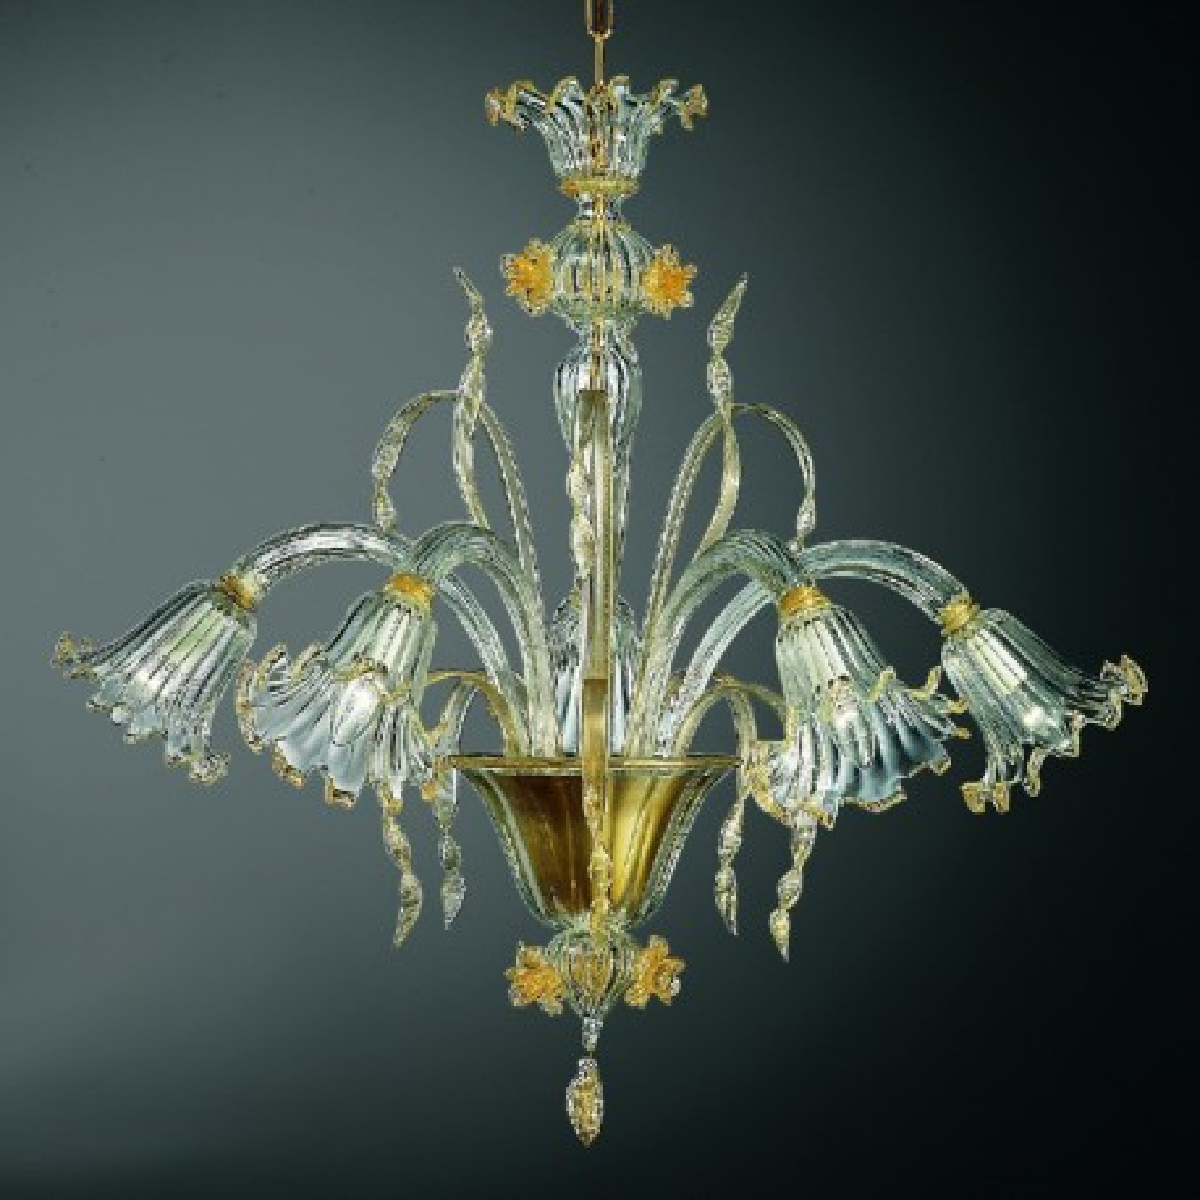 Mori 5 lights Murano chandelier - transparent gold color